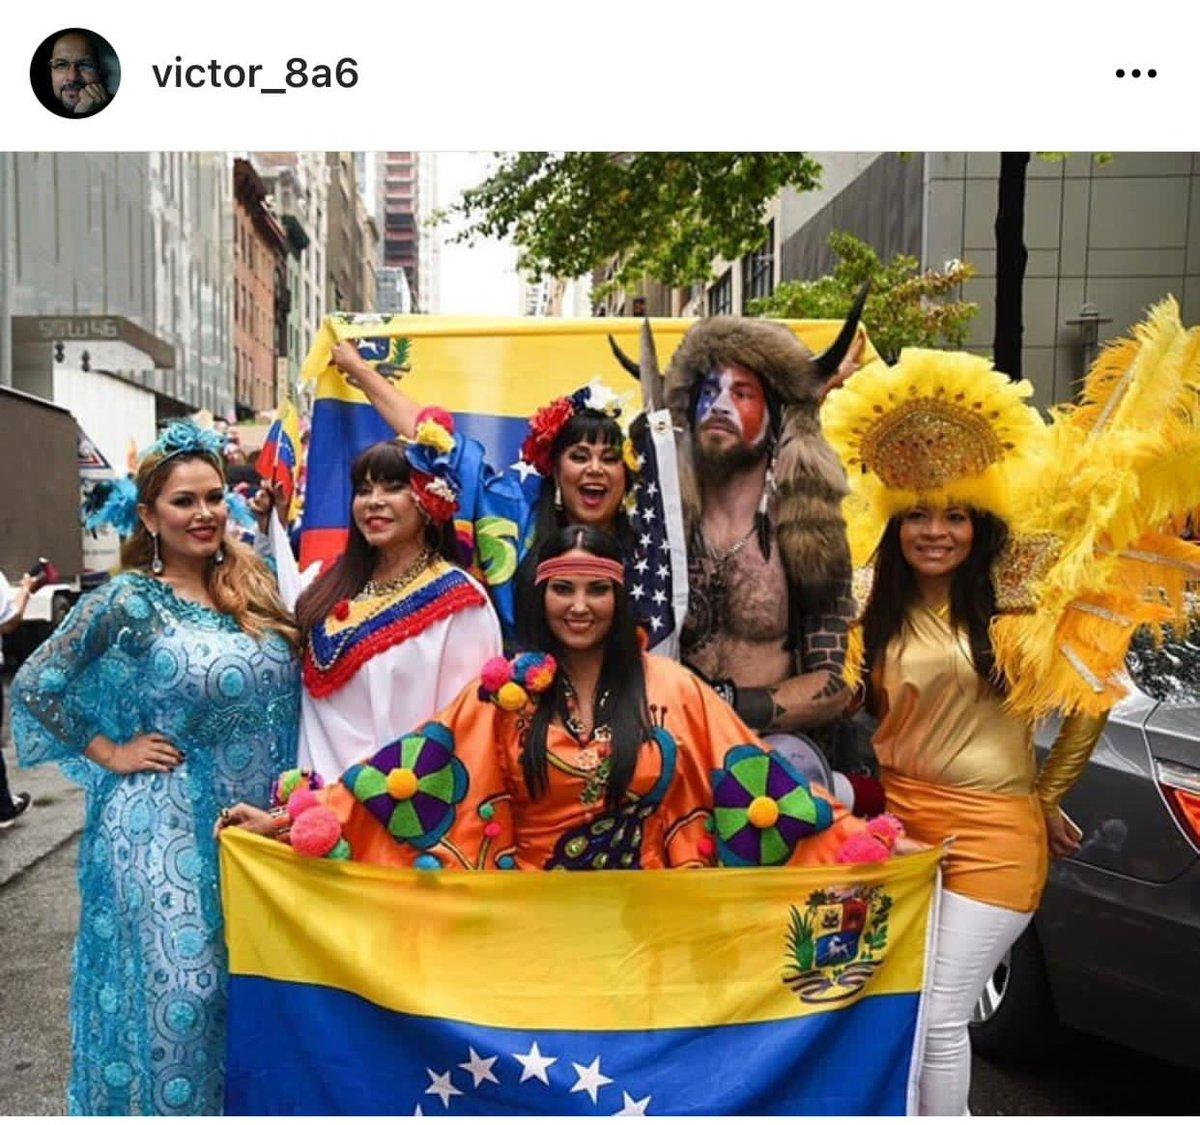 Venezuela crisis economica - Página 25 ErK5Y7cWMAAcO0q?format=jpg&name=medium